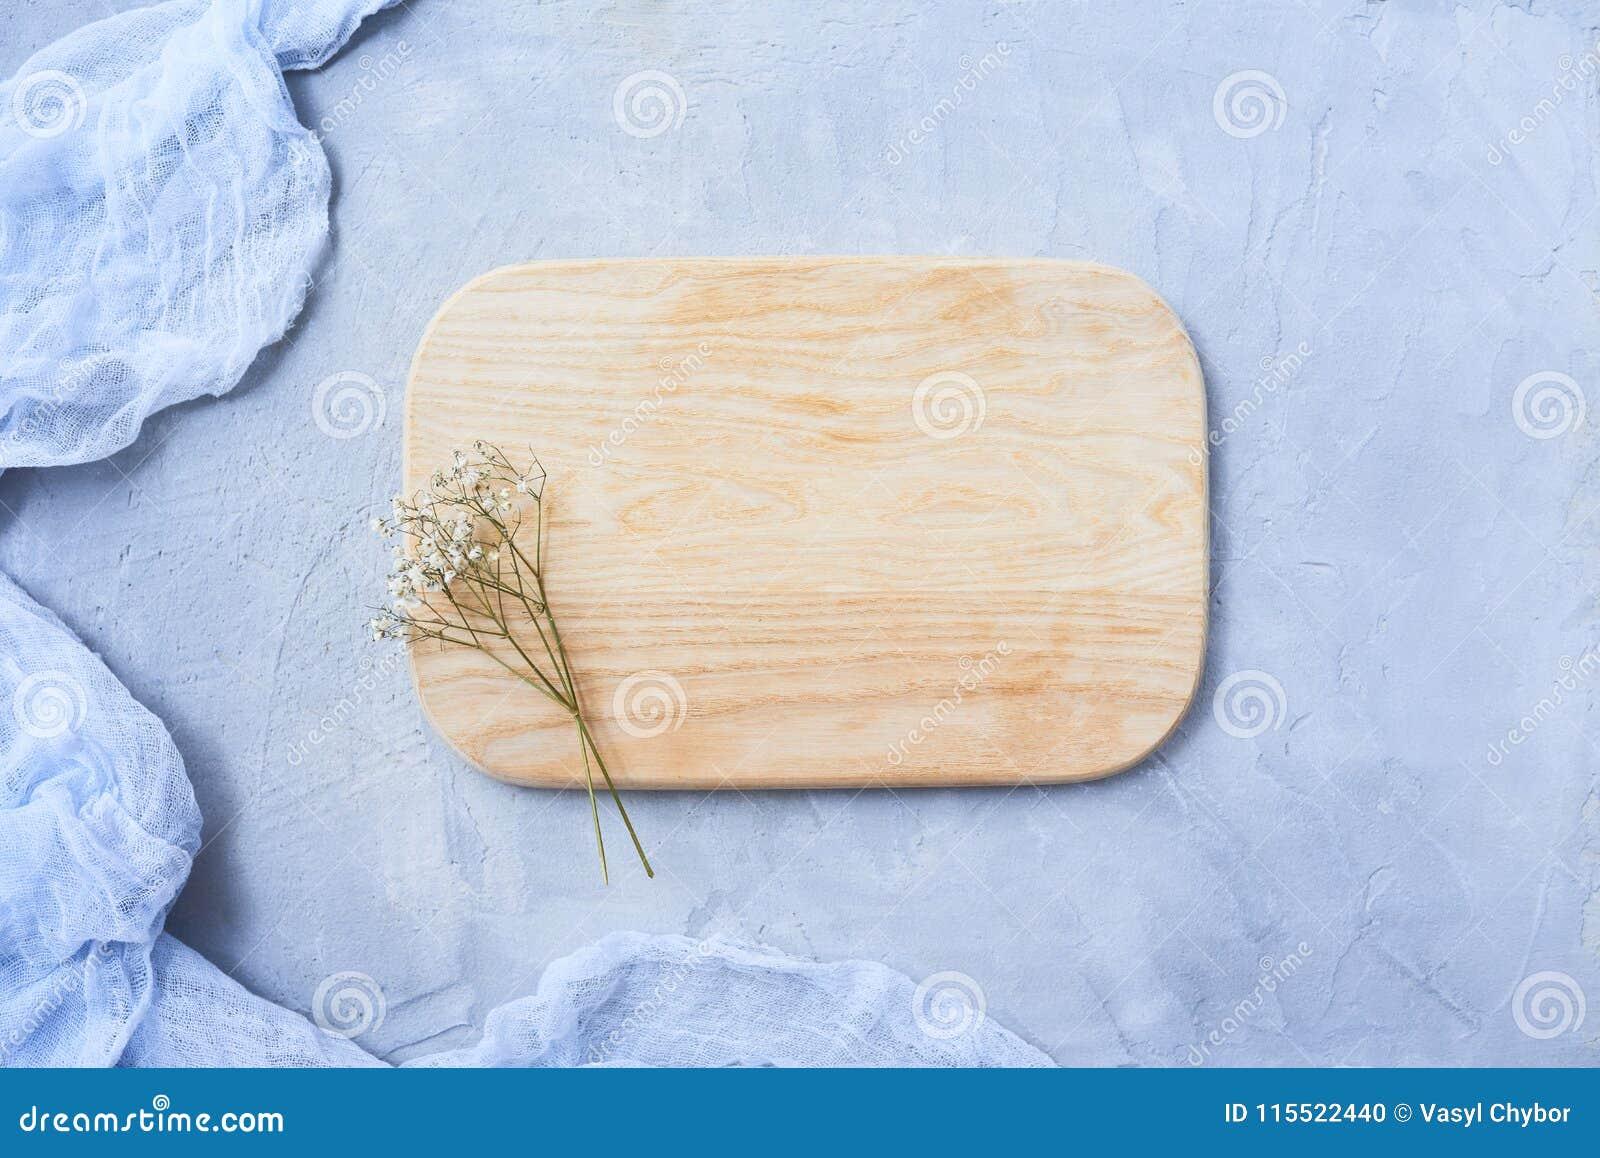 Cutting board on rustic background